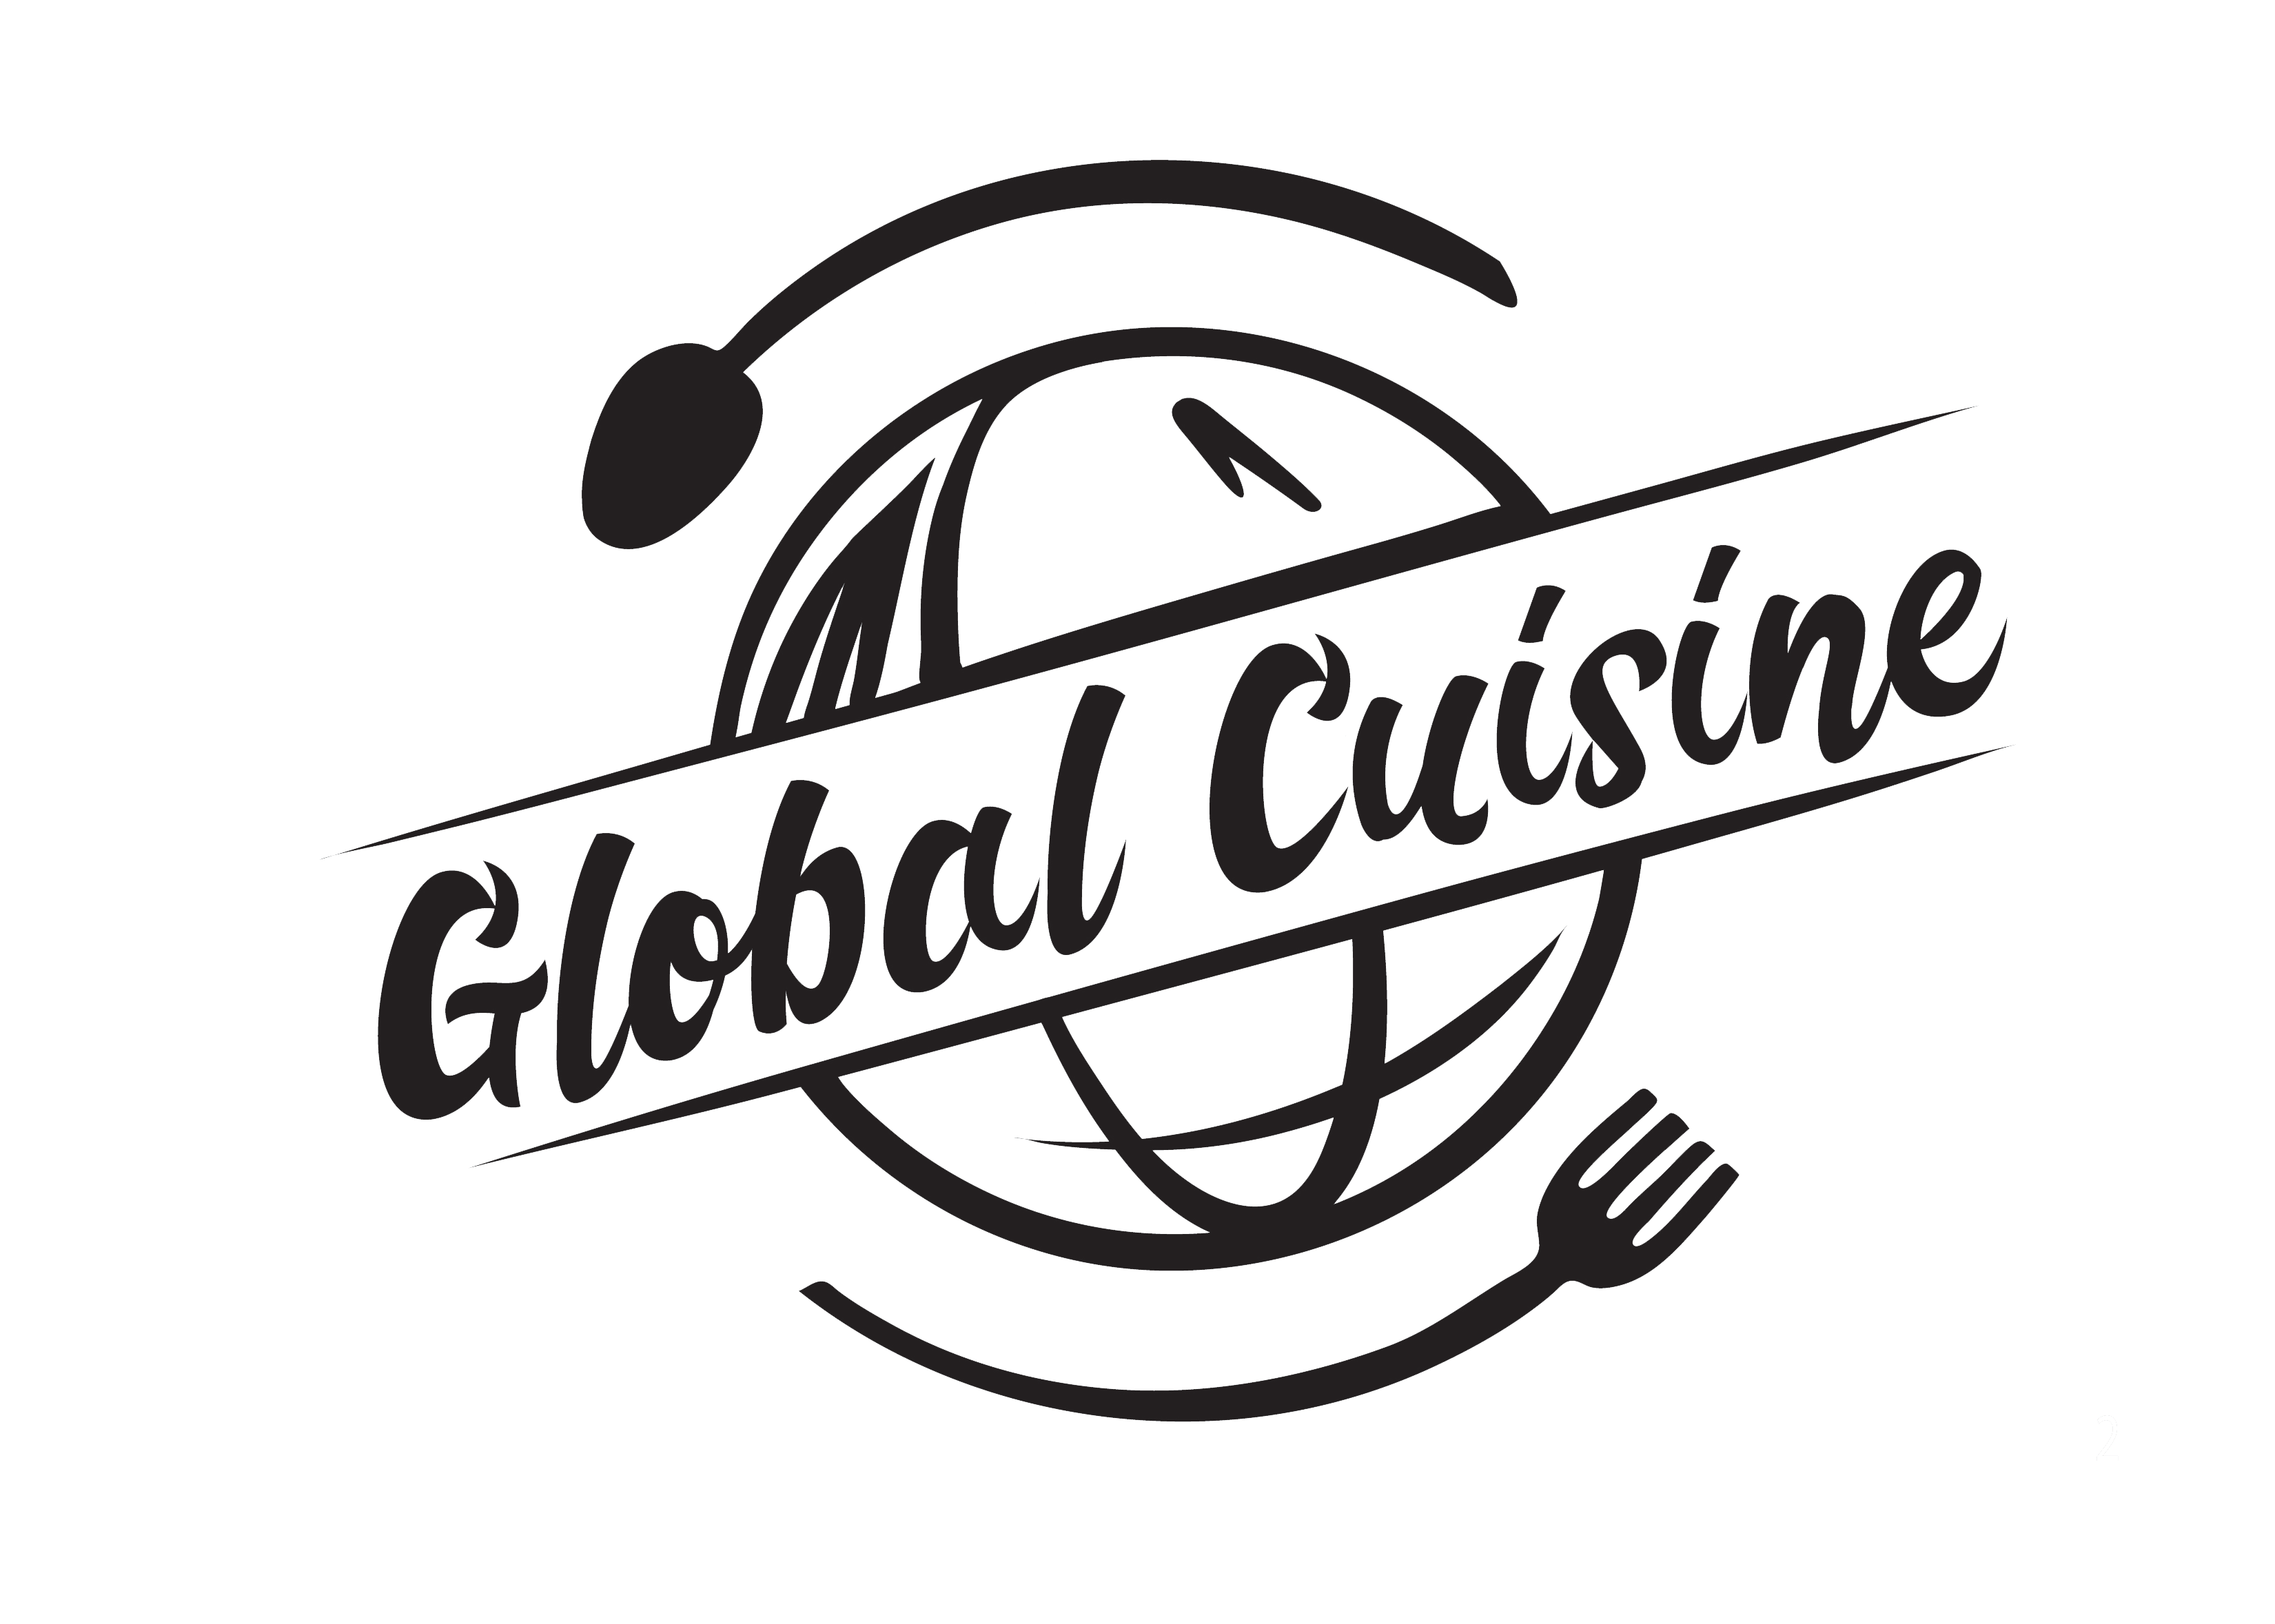 12929 Global Cuisine logo2 PNG